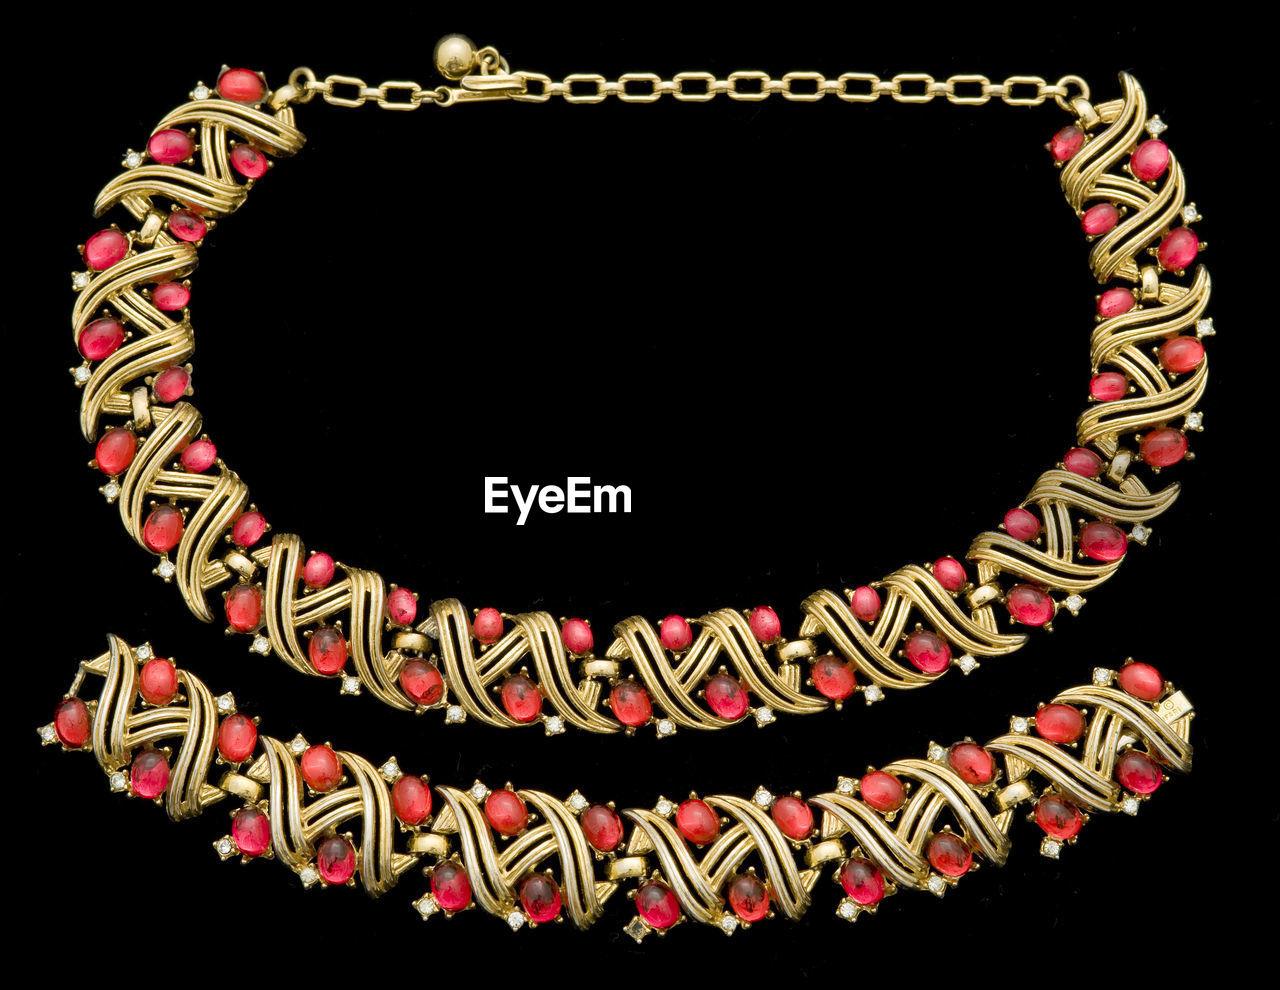 Close-Up Of Necklace And Bracelet Over Black Background